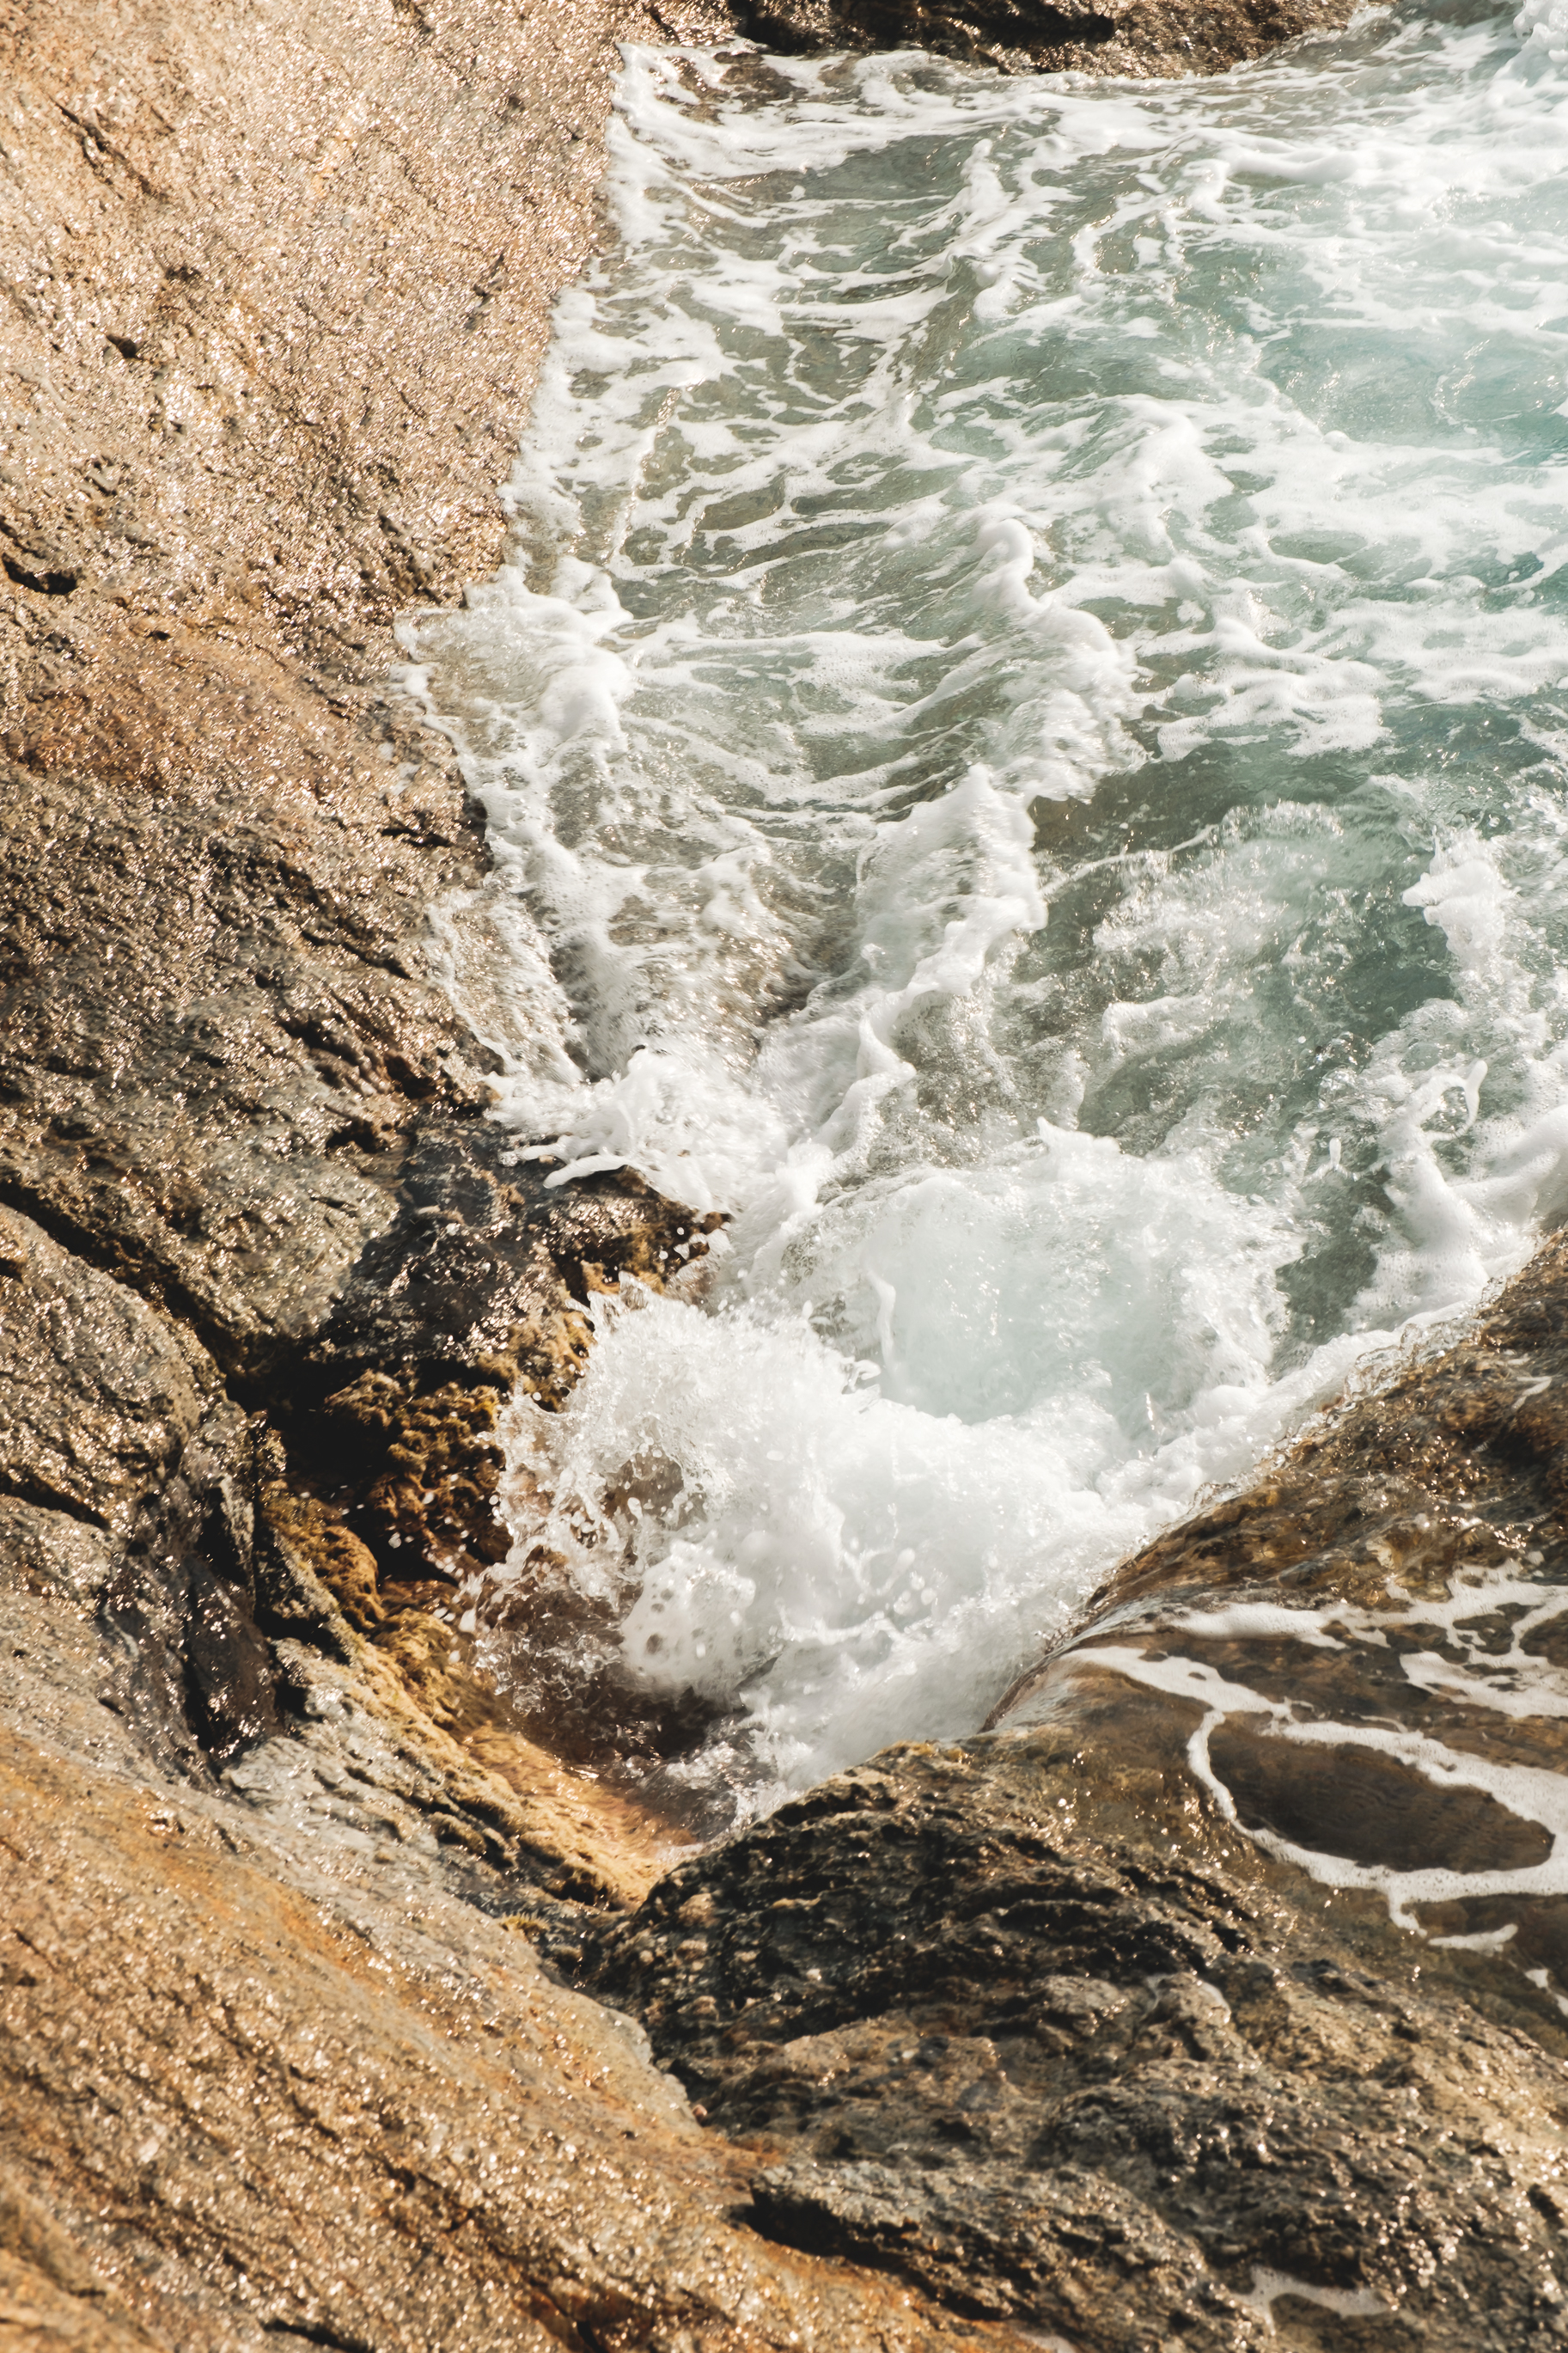 foamy seawater washing rough rocky cliff